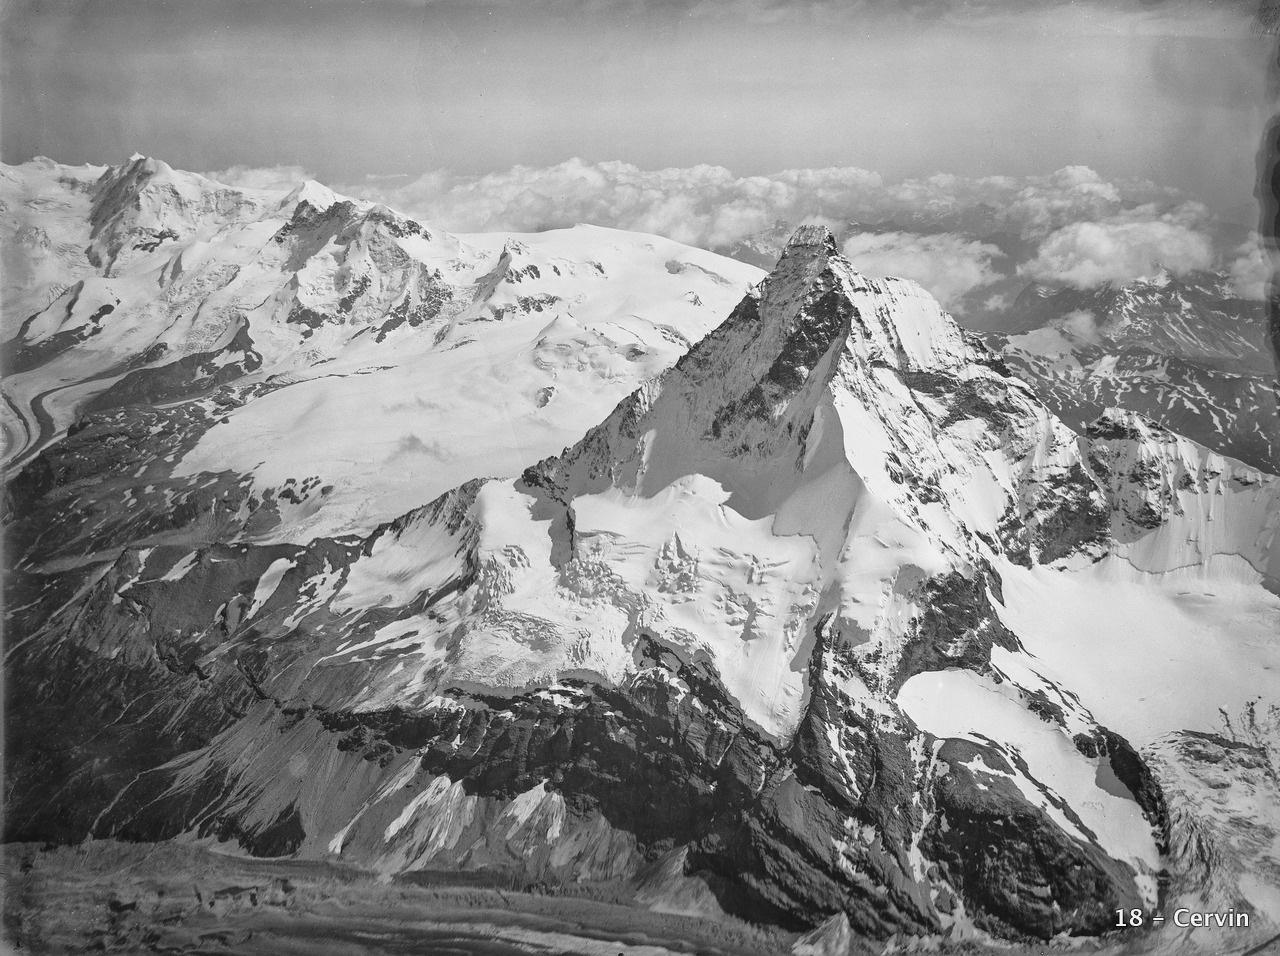 lossy-page1-1280px-CH-NB_-_Matterhorn_-_Eduard_Spelterini_-_EAD-WEHR-32053-B.tif